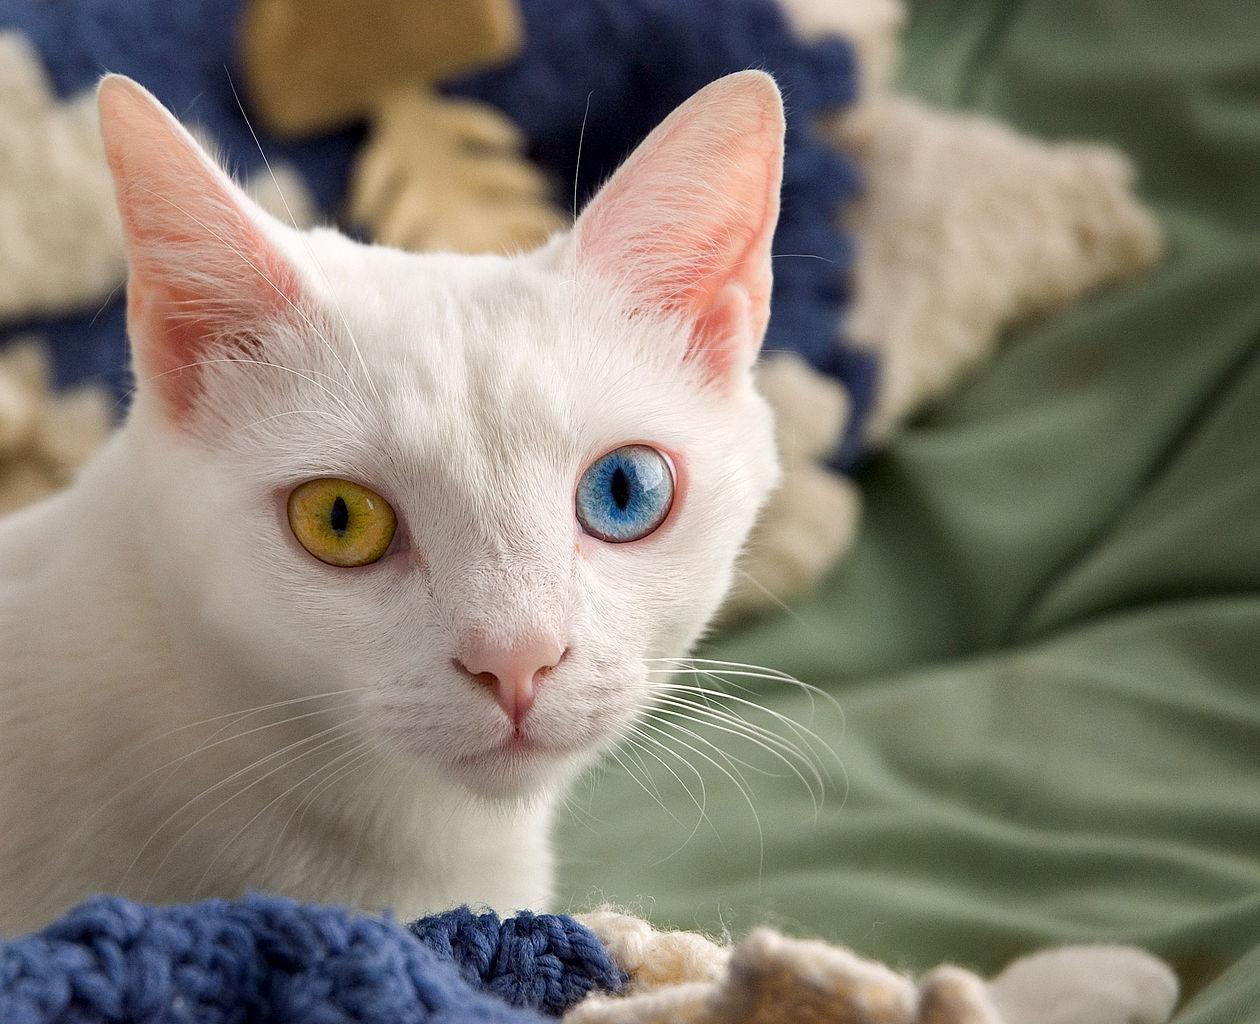 1260px-June_odd-eyed-cat.jpg